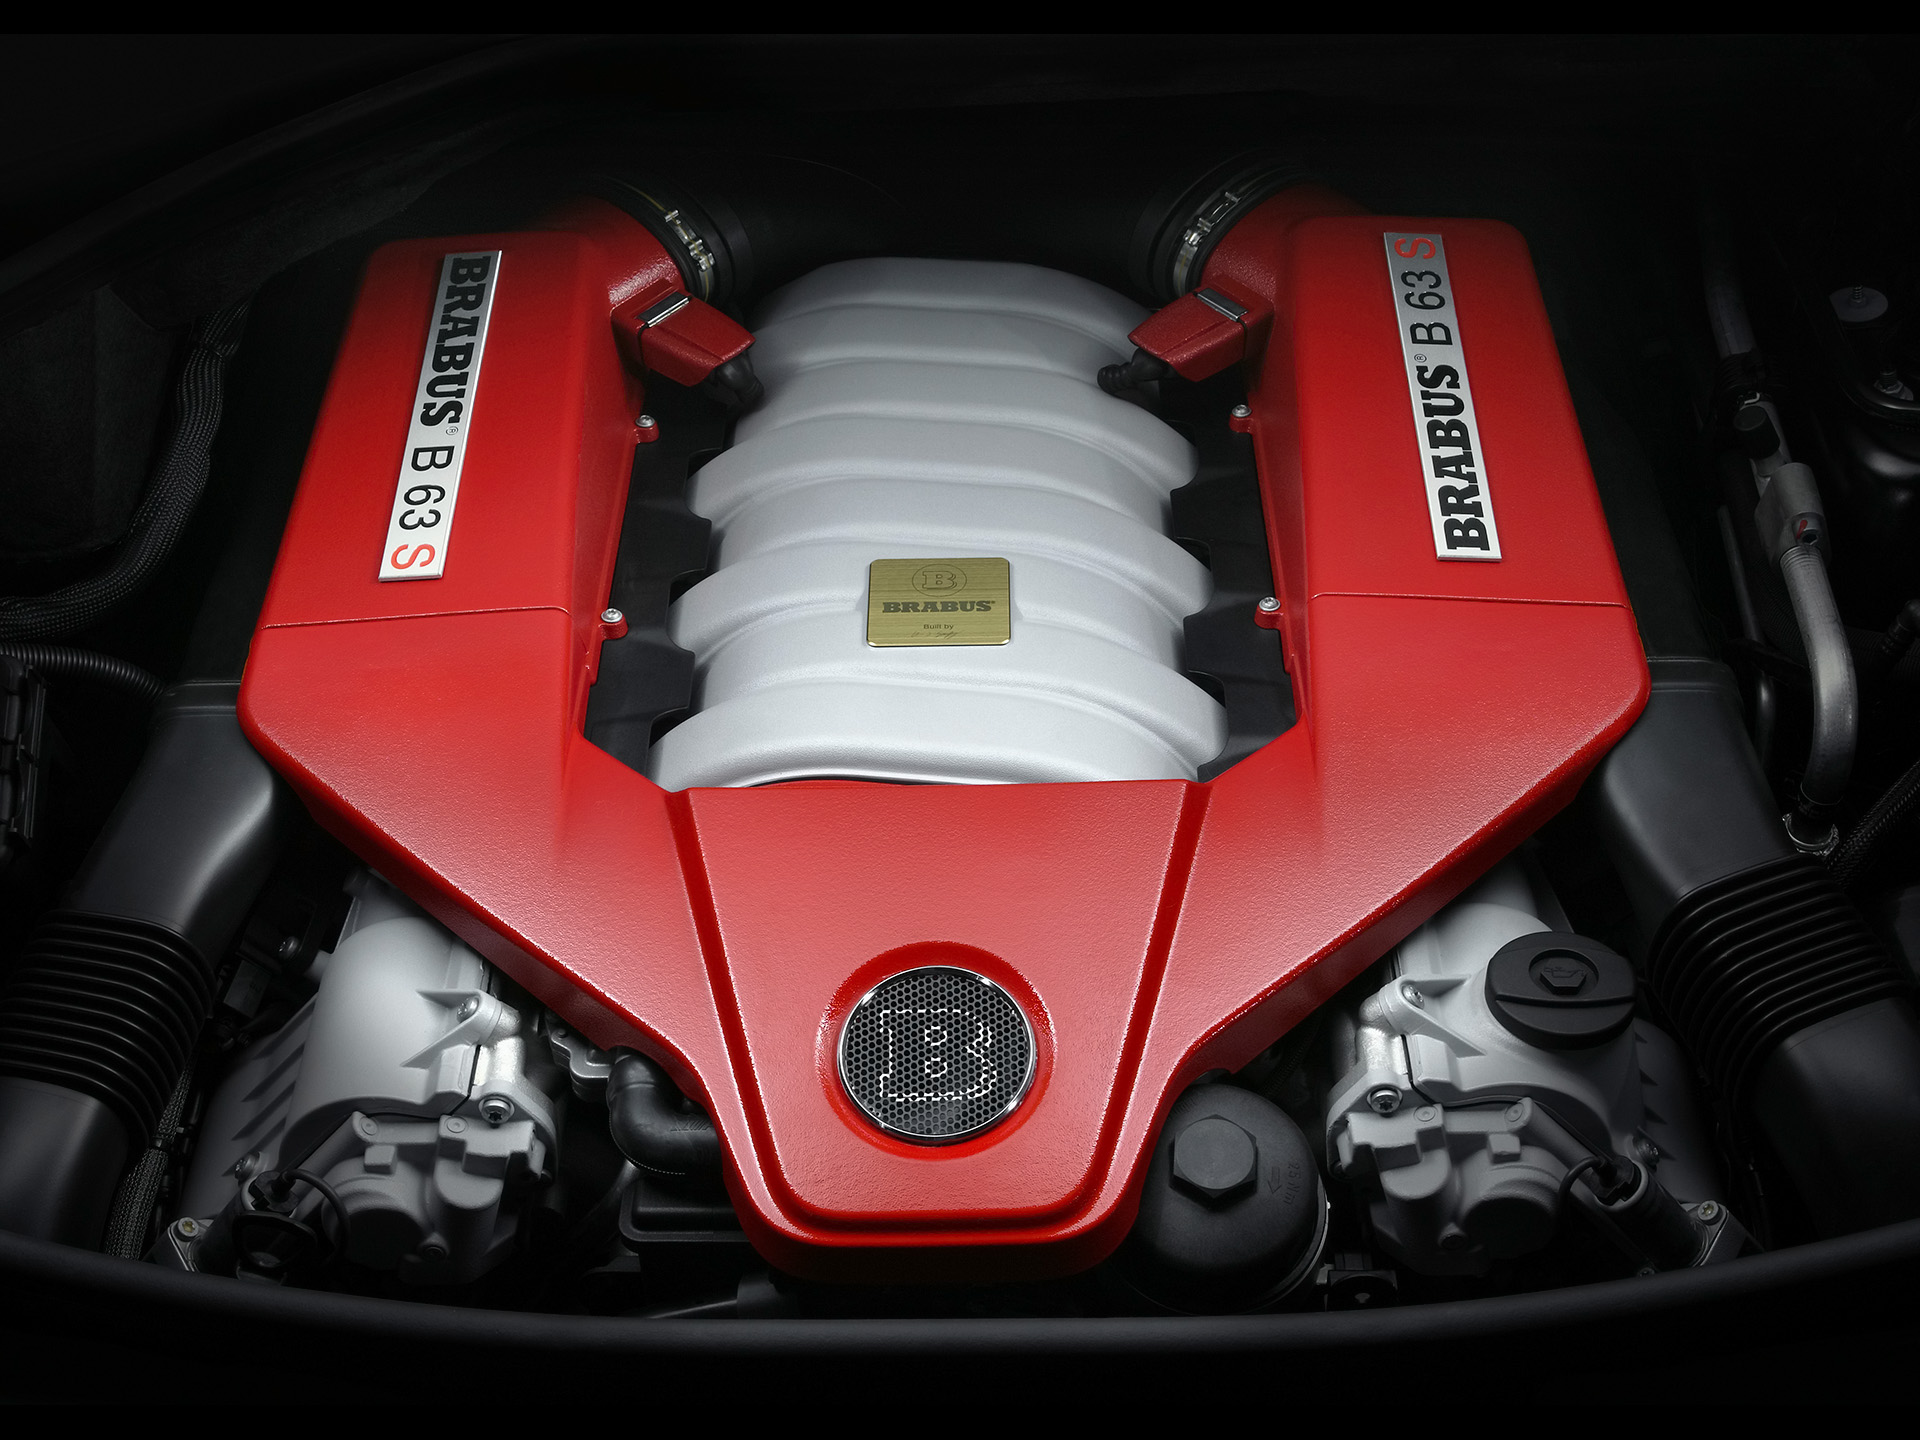 2007 Brabus B63 S Mercedes Benz 63 Amg Silnik 1920x1440